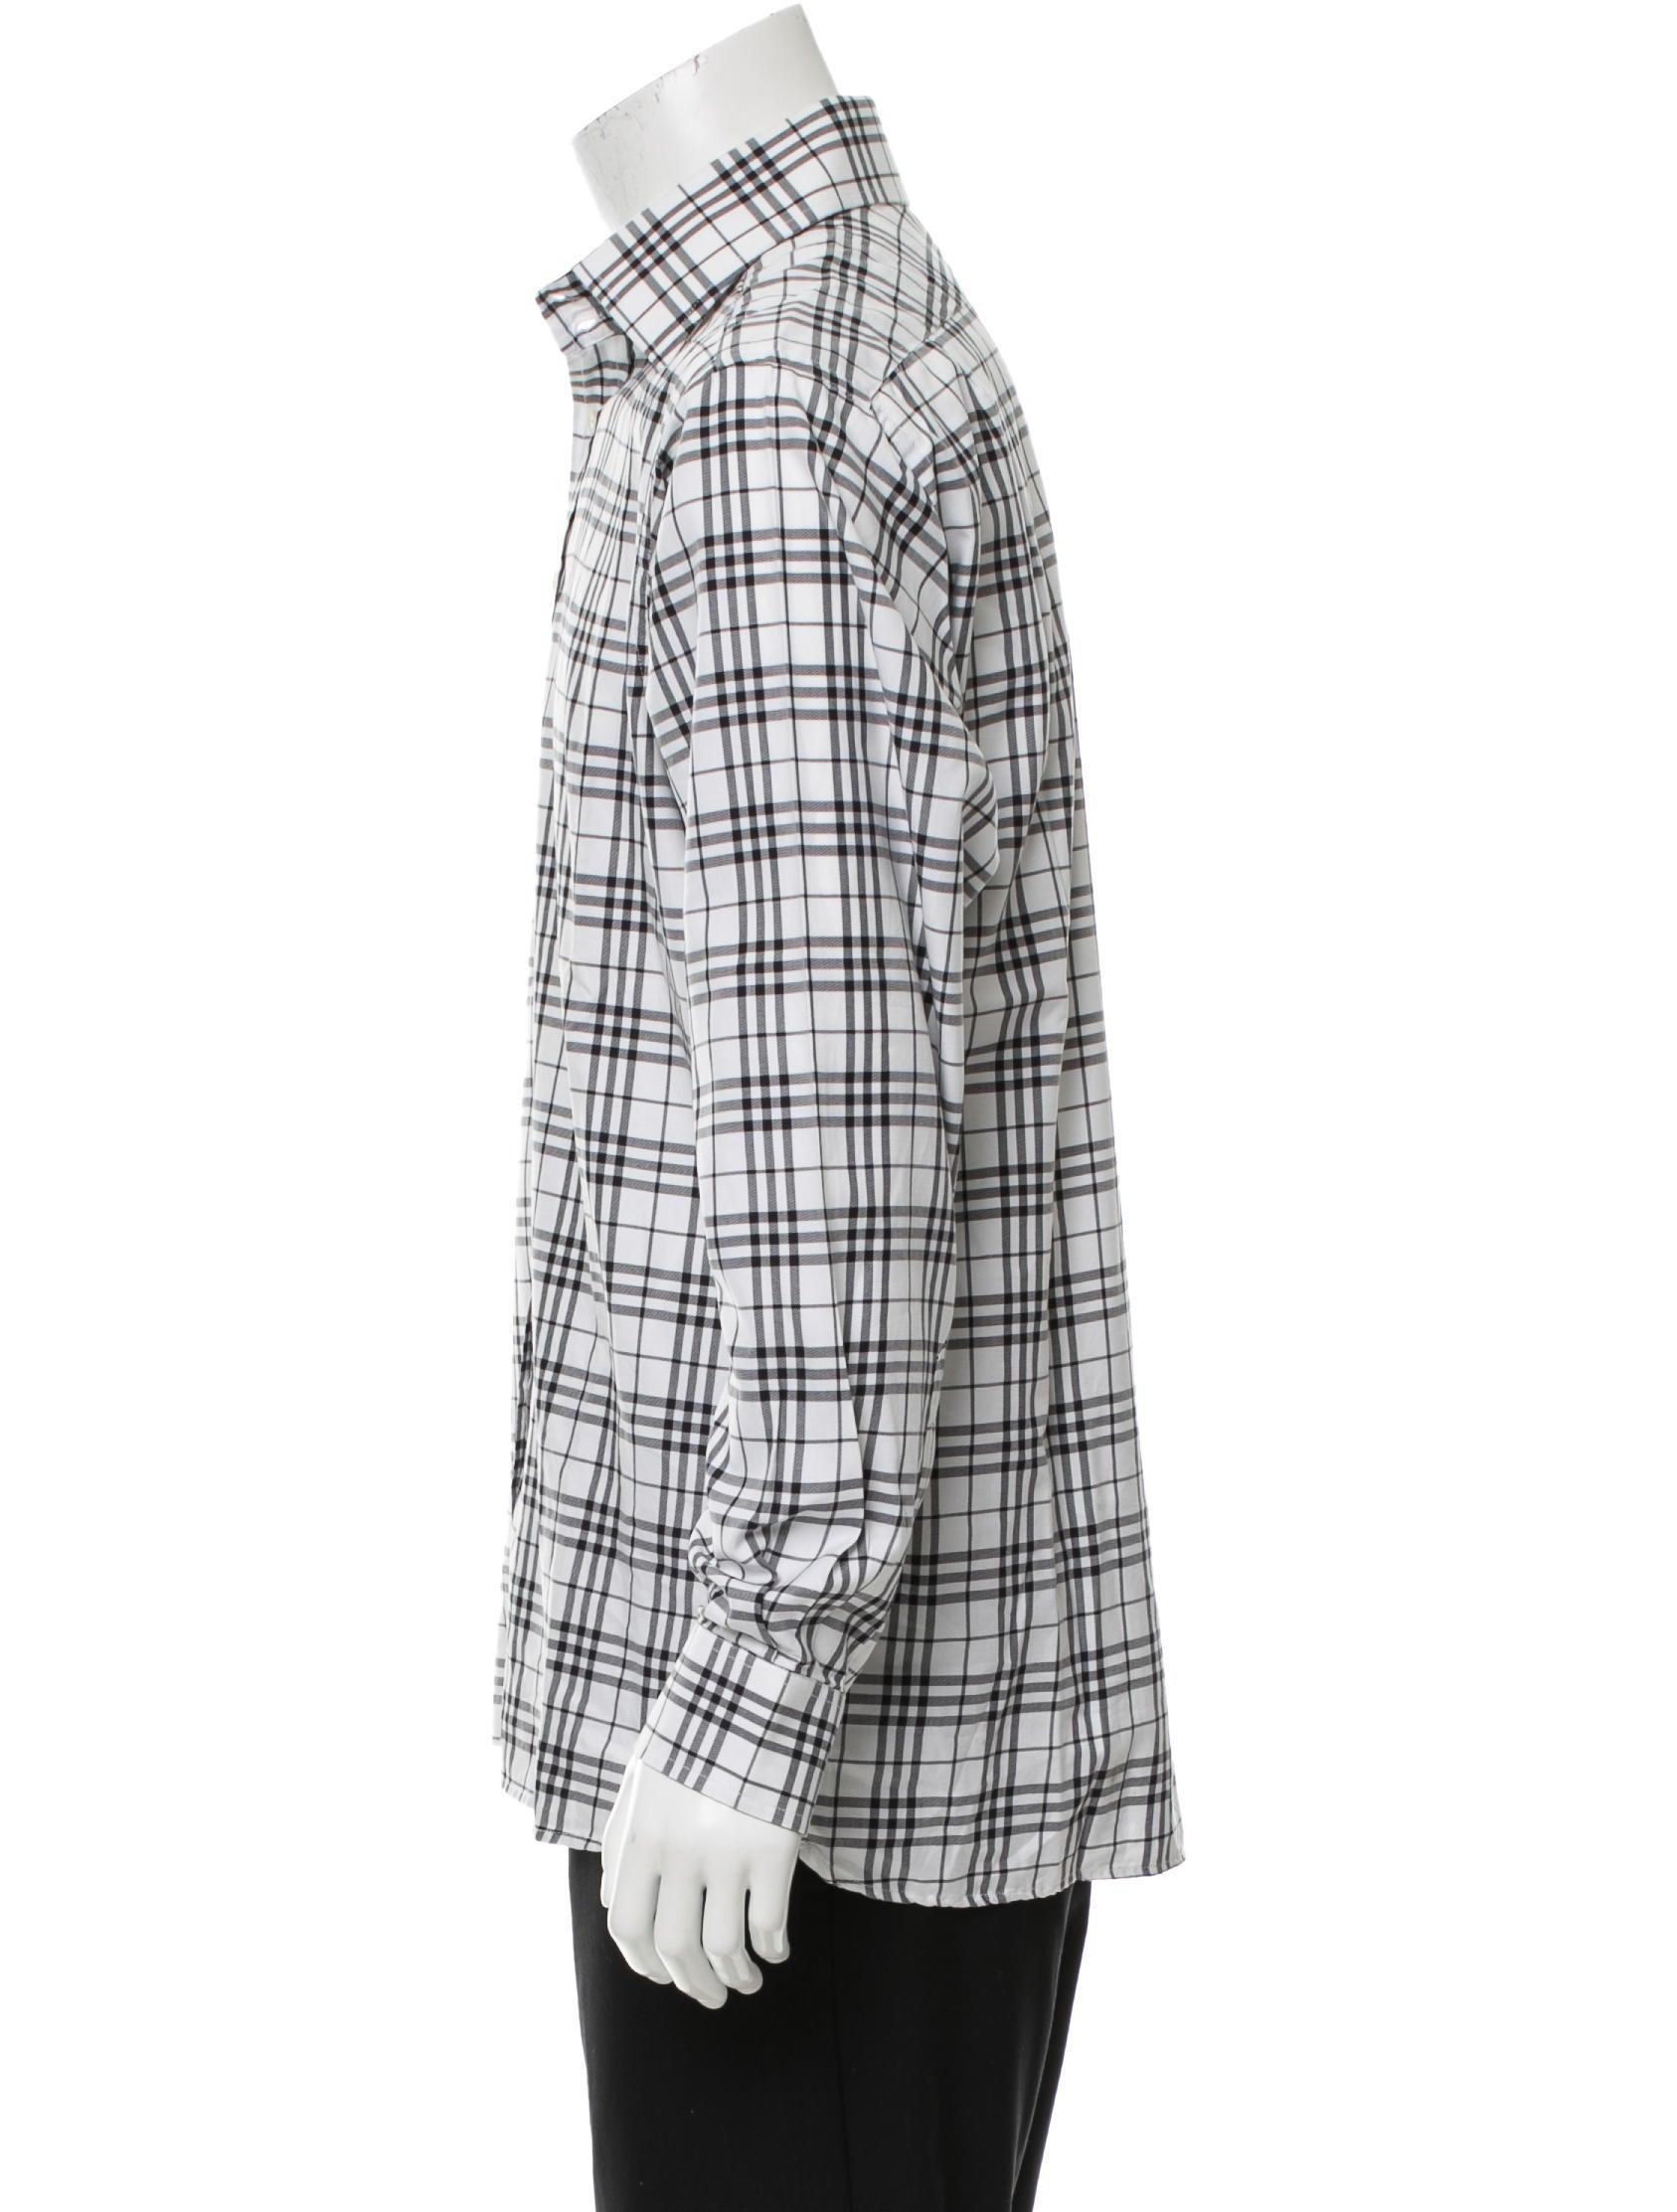 Burberry London Plaid Button-Up Shirt - Clothing ...